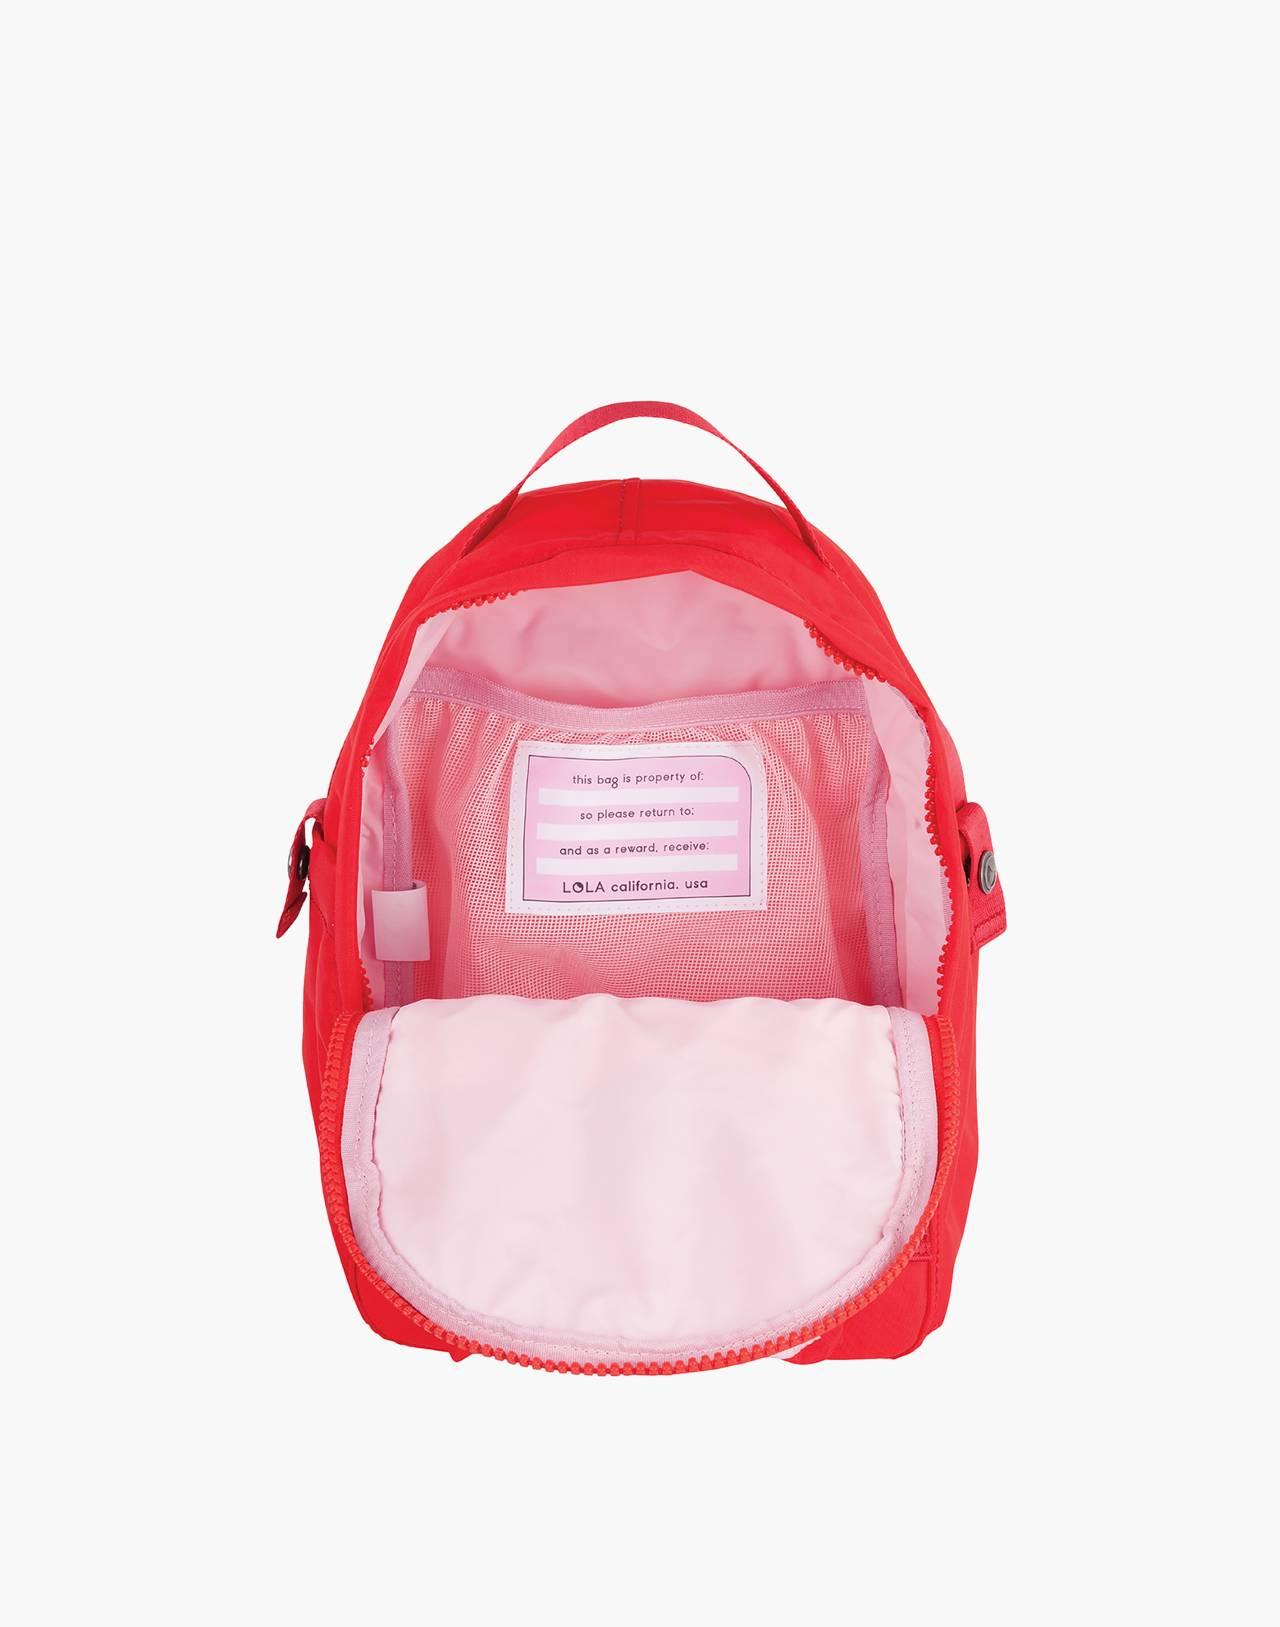 LOLA™ Mondo Utopian Small Backpack in red image 2